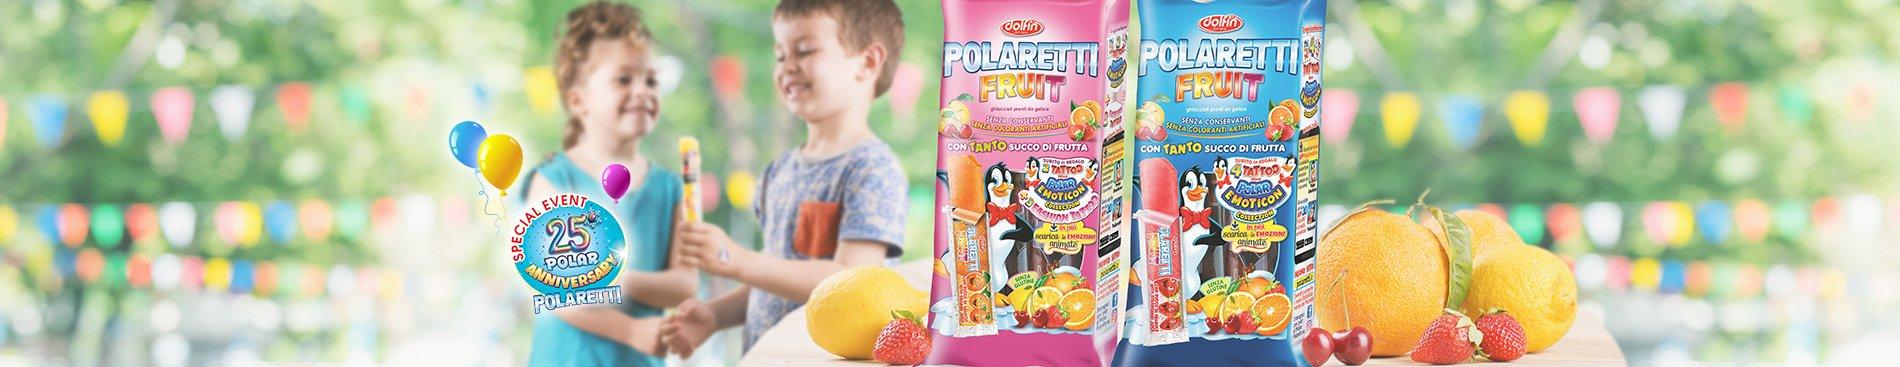 2017 Polaretti Fruit